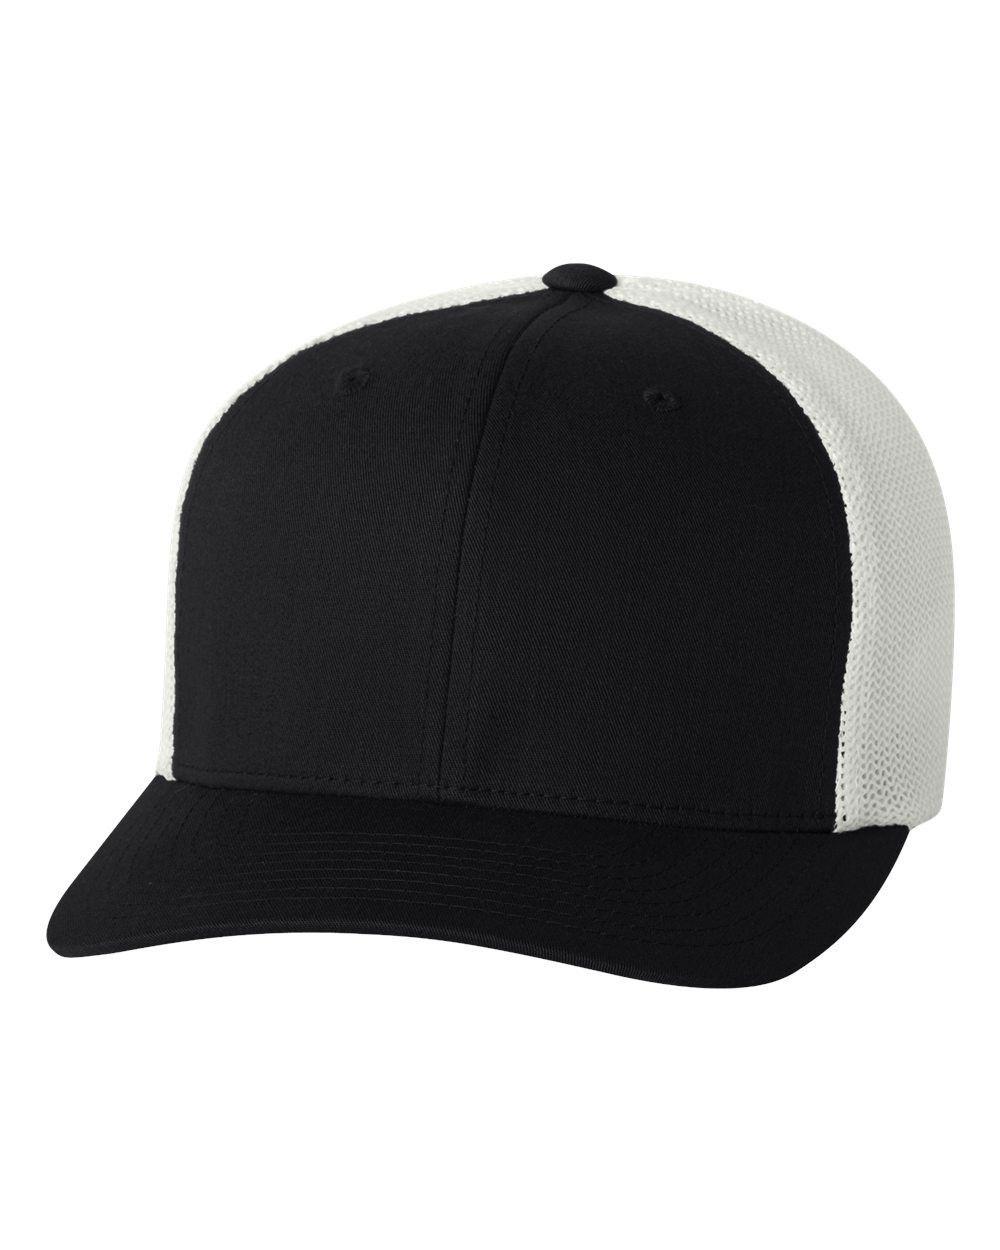 27d8392e1657f Flexfit - Trucker Cap - 6511 Black  white